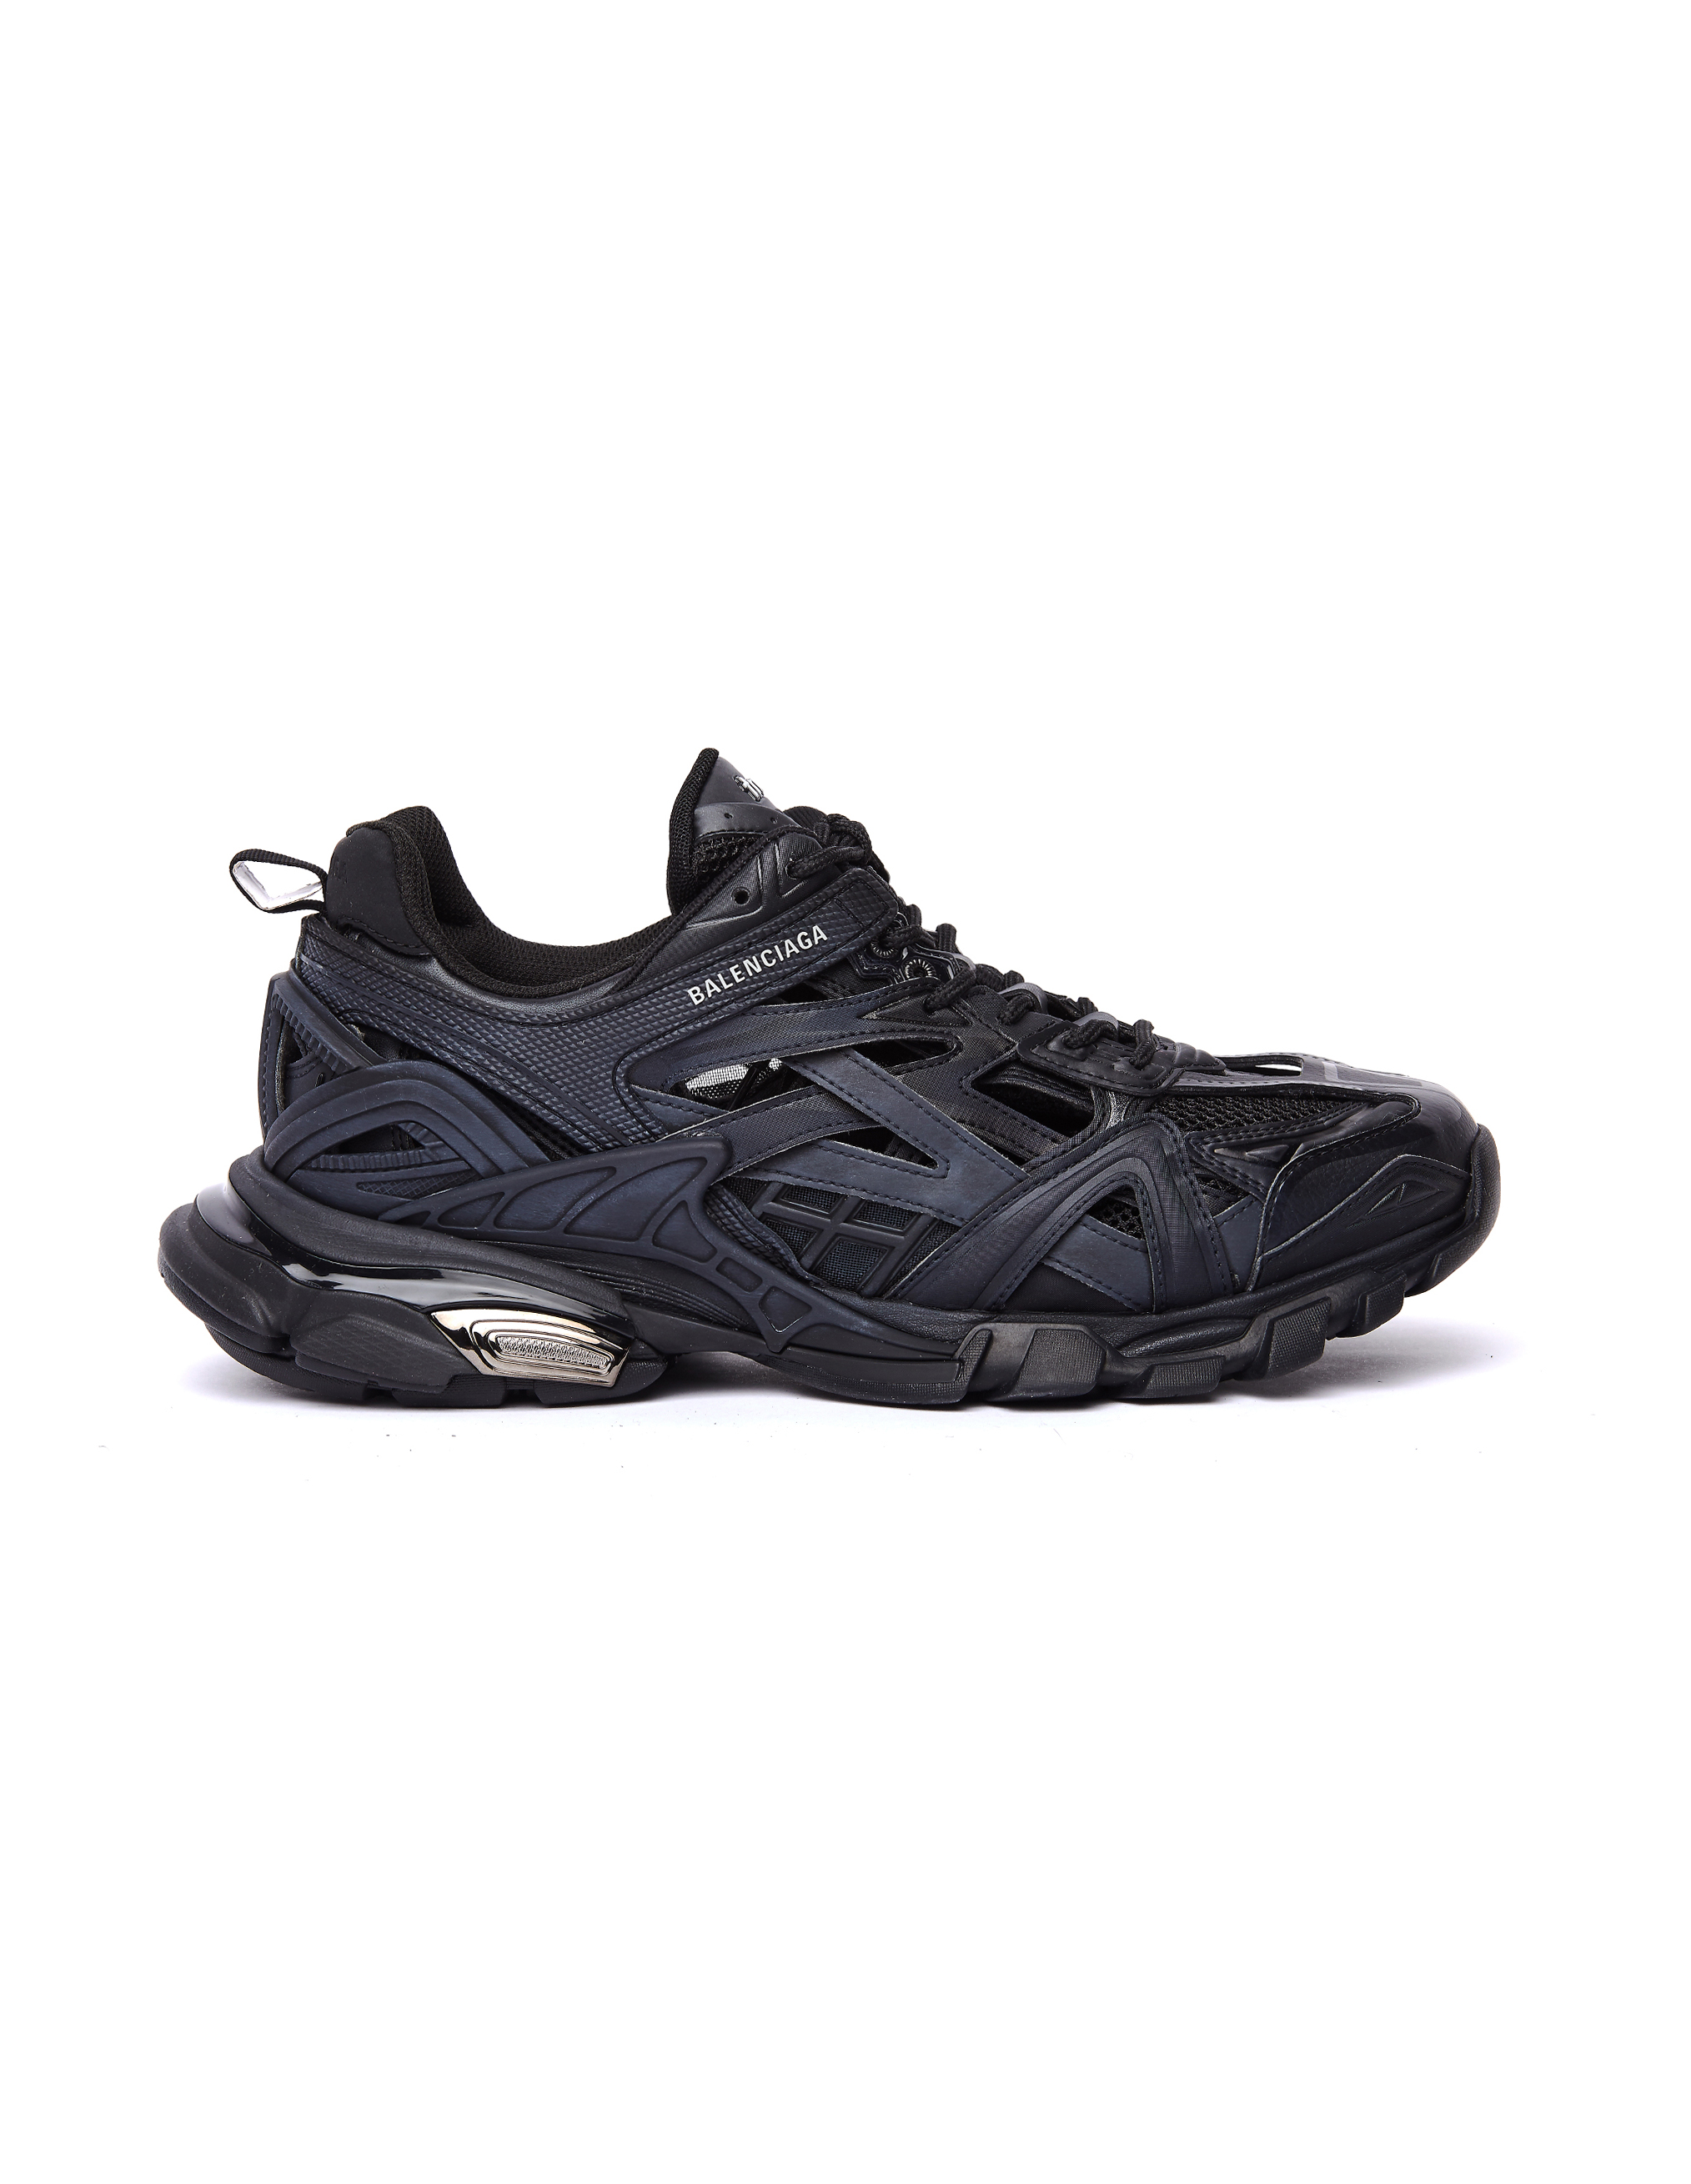 Balenciaga Black Track 2 Sneakers